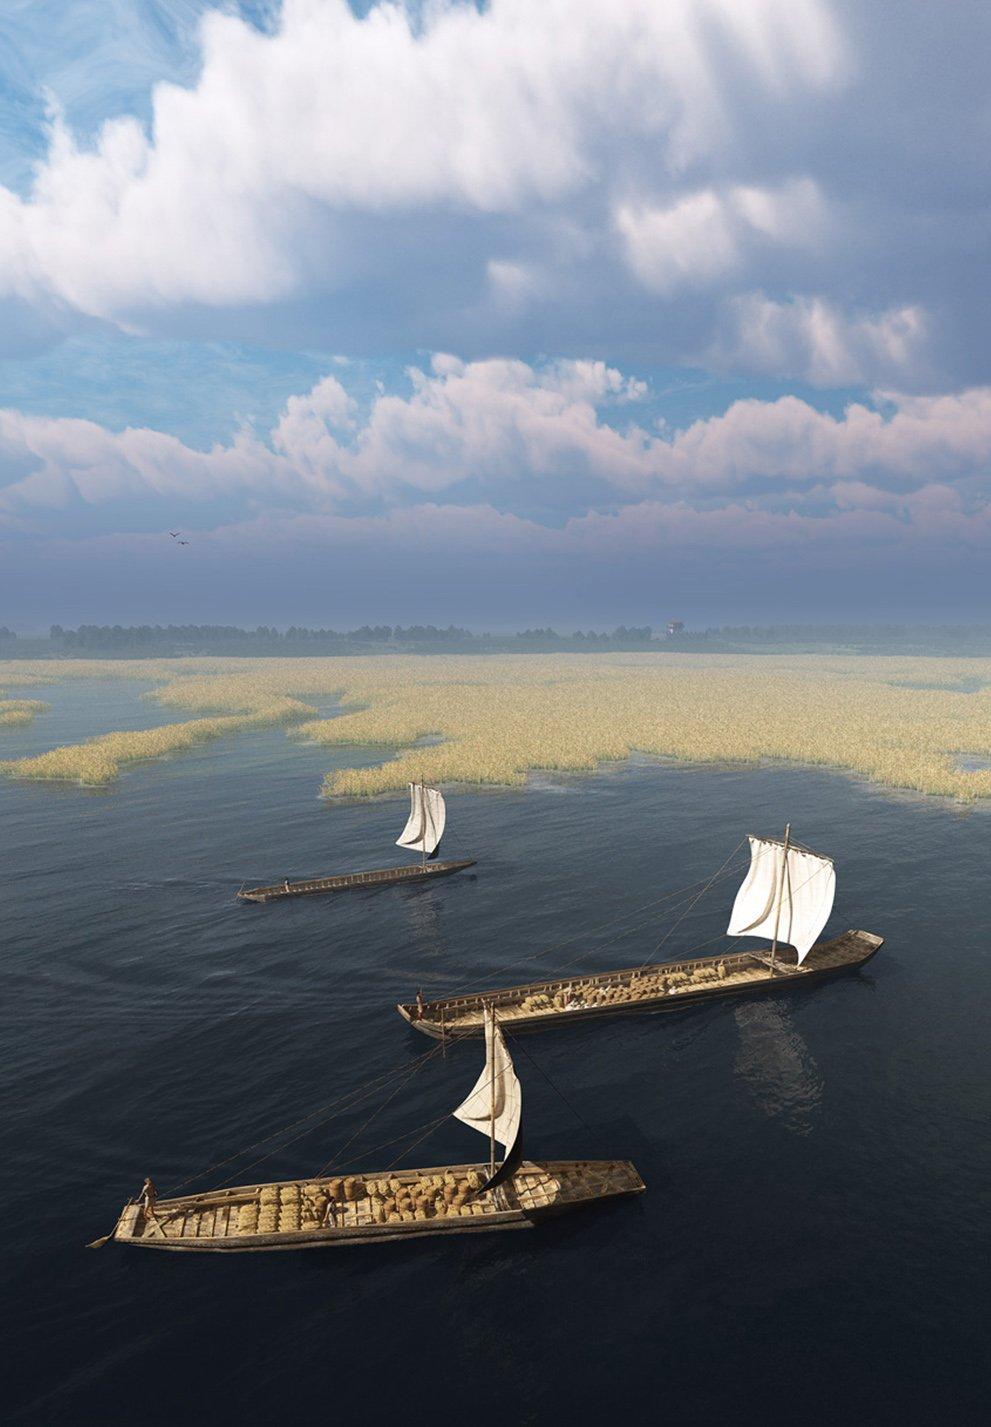 Kriek_5-Roman riverboats